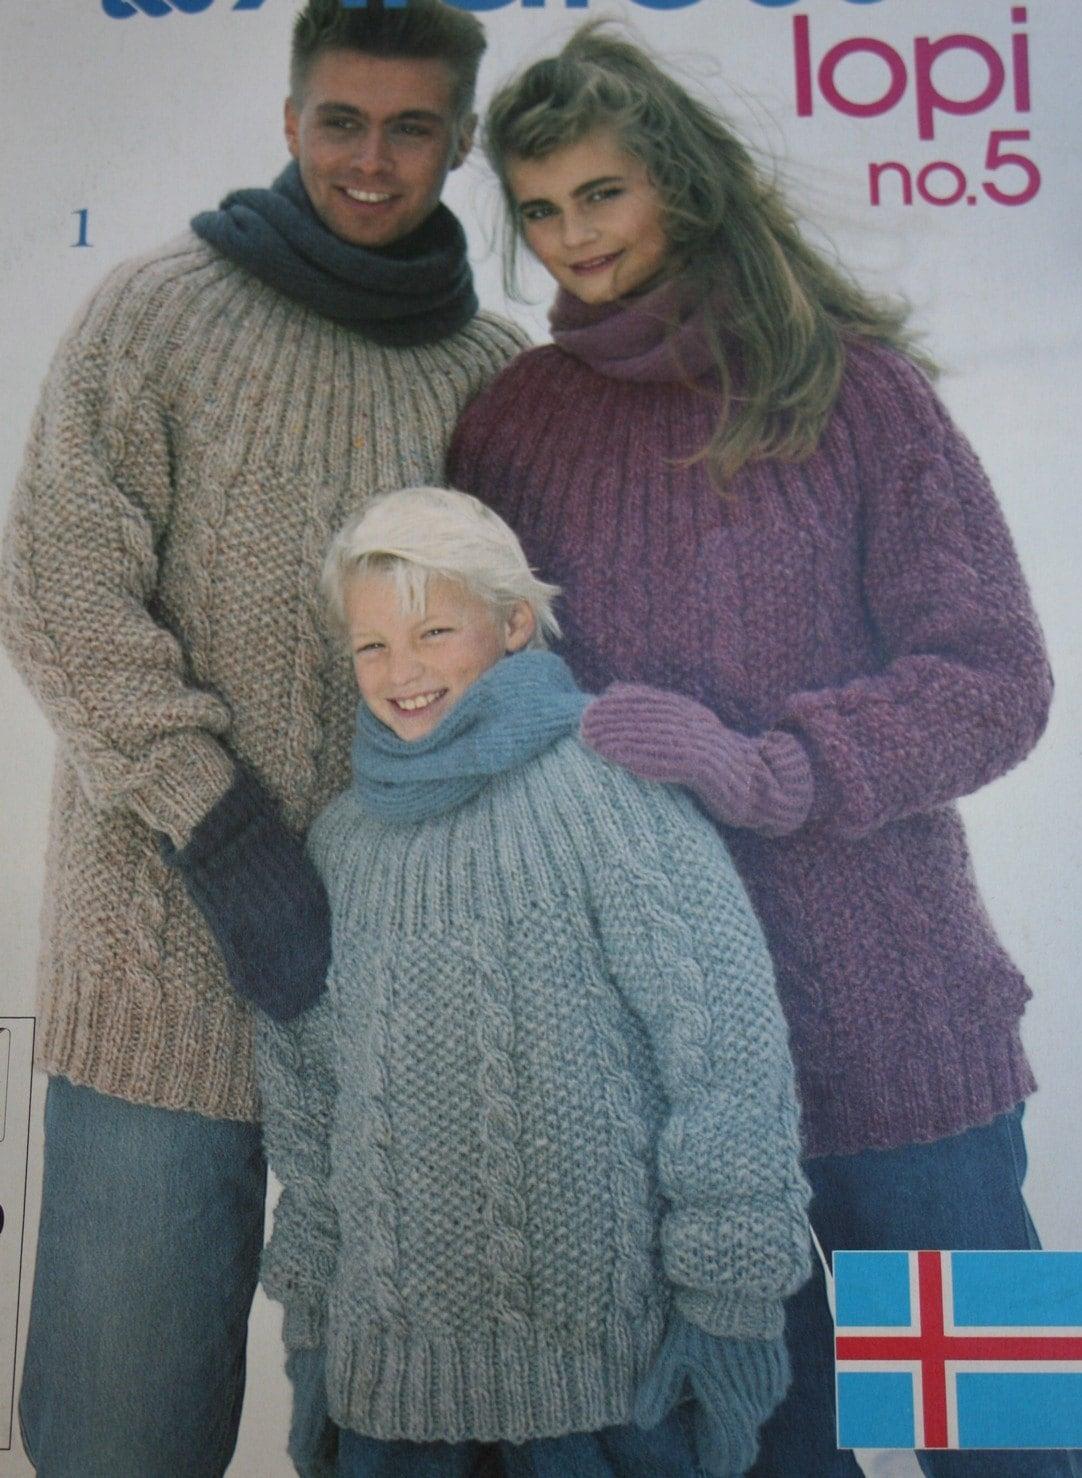 Sweater Knitting Patterns Cardigan Vest Alafoss Lopi 5 Men Women ...